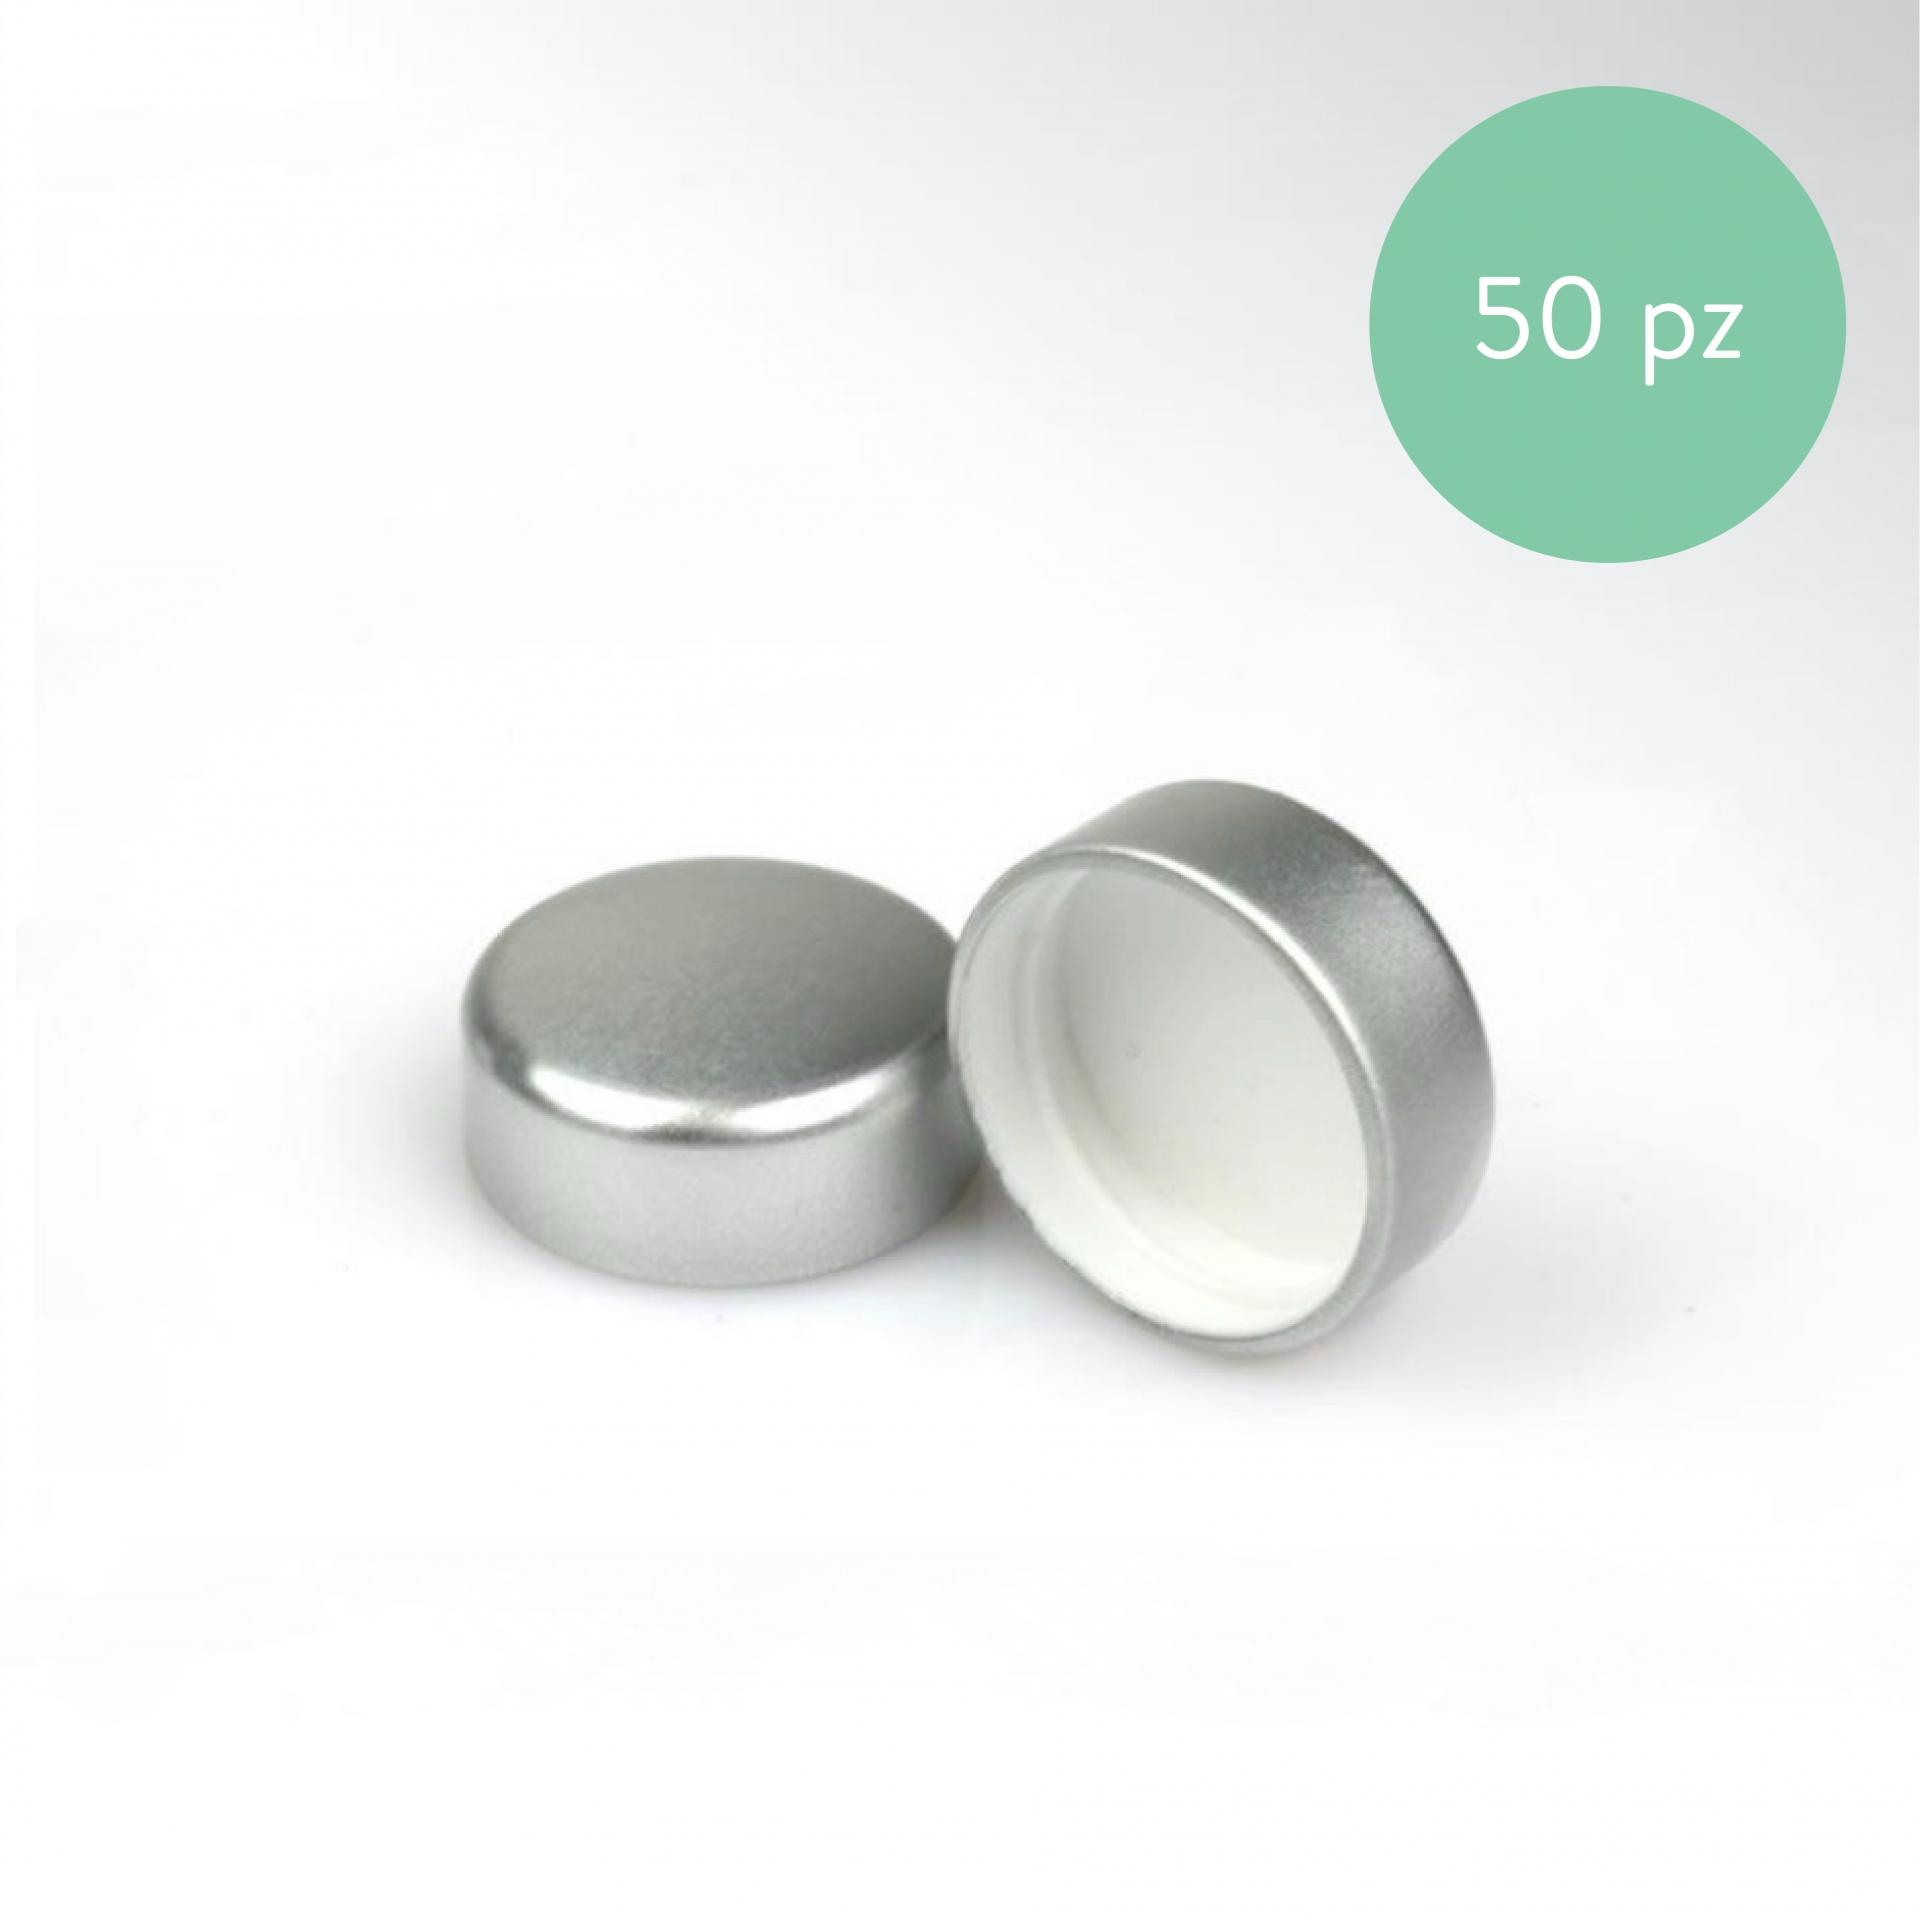 50-pz-argento,4791?WebbinsCacheCounter=1